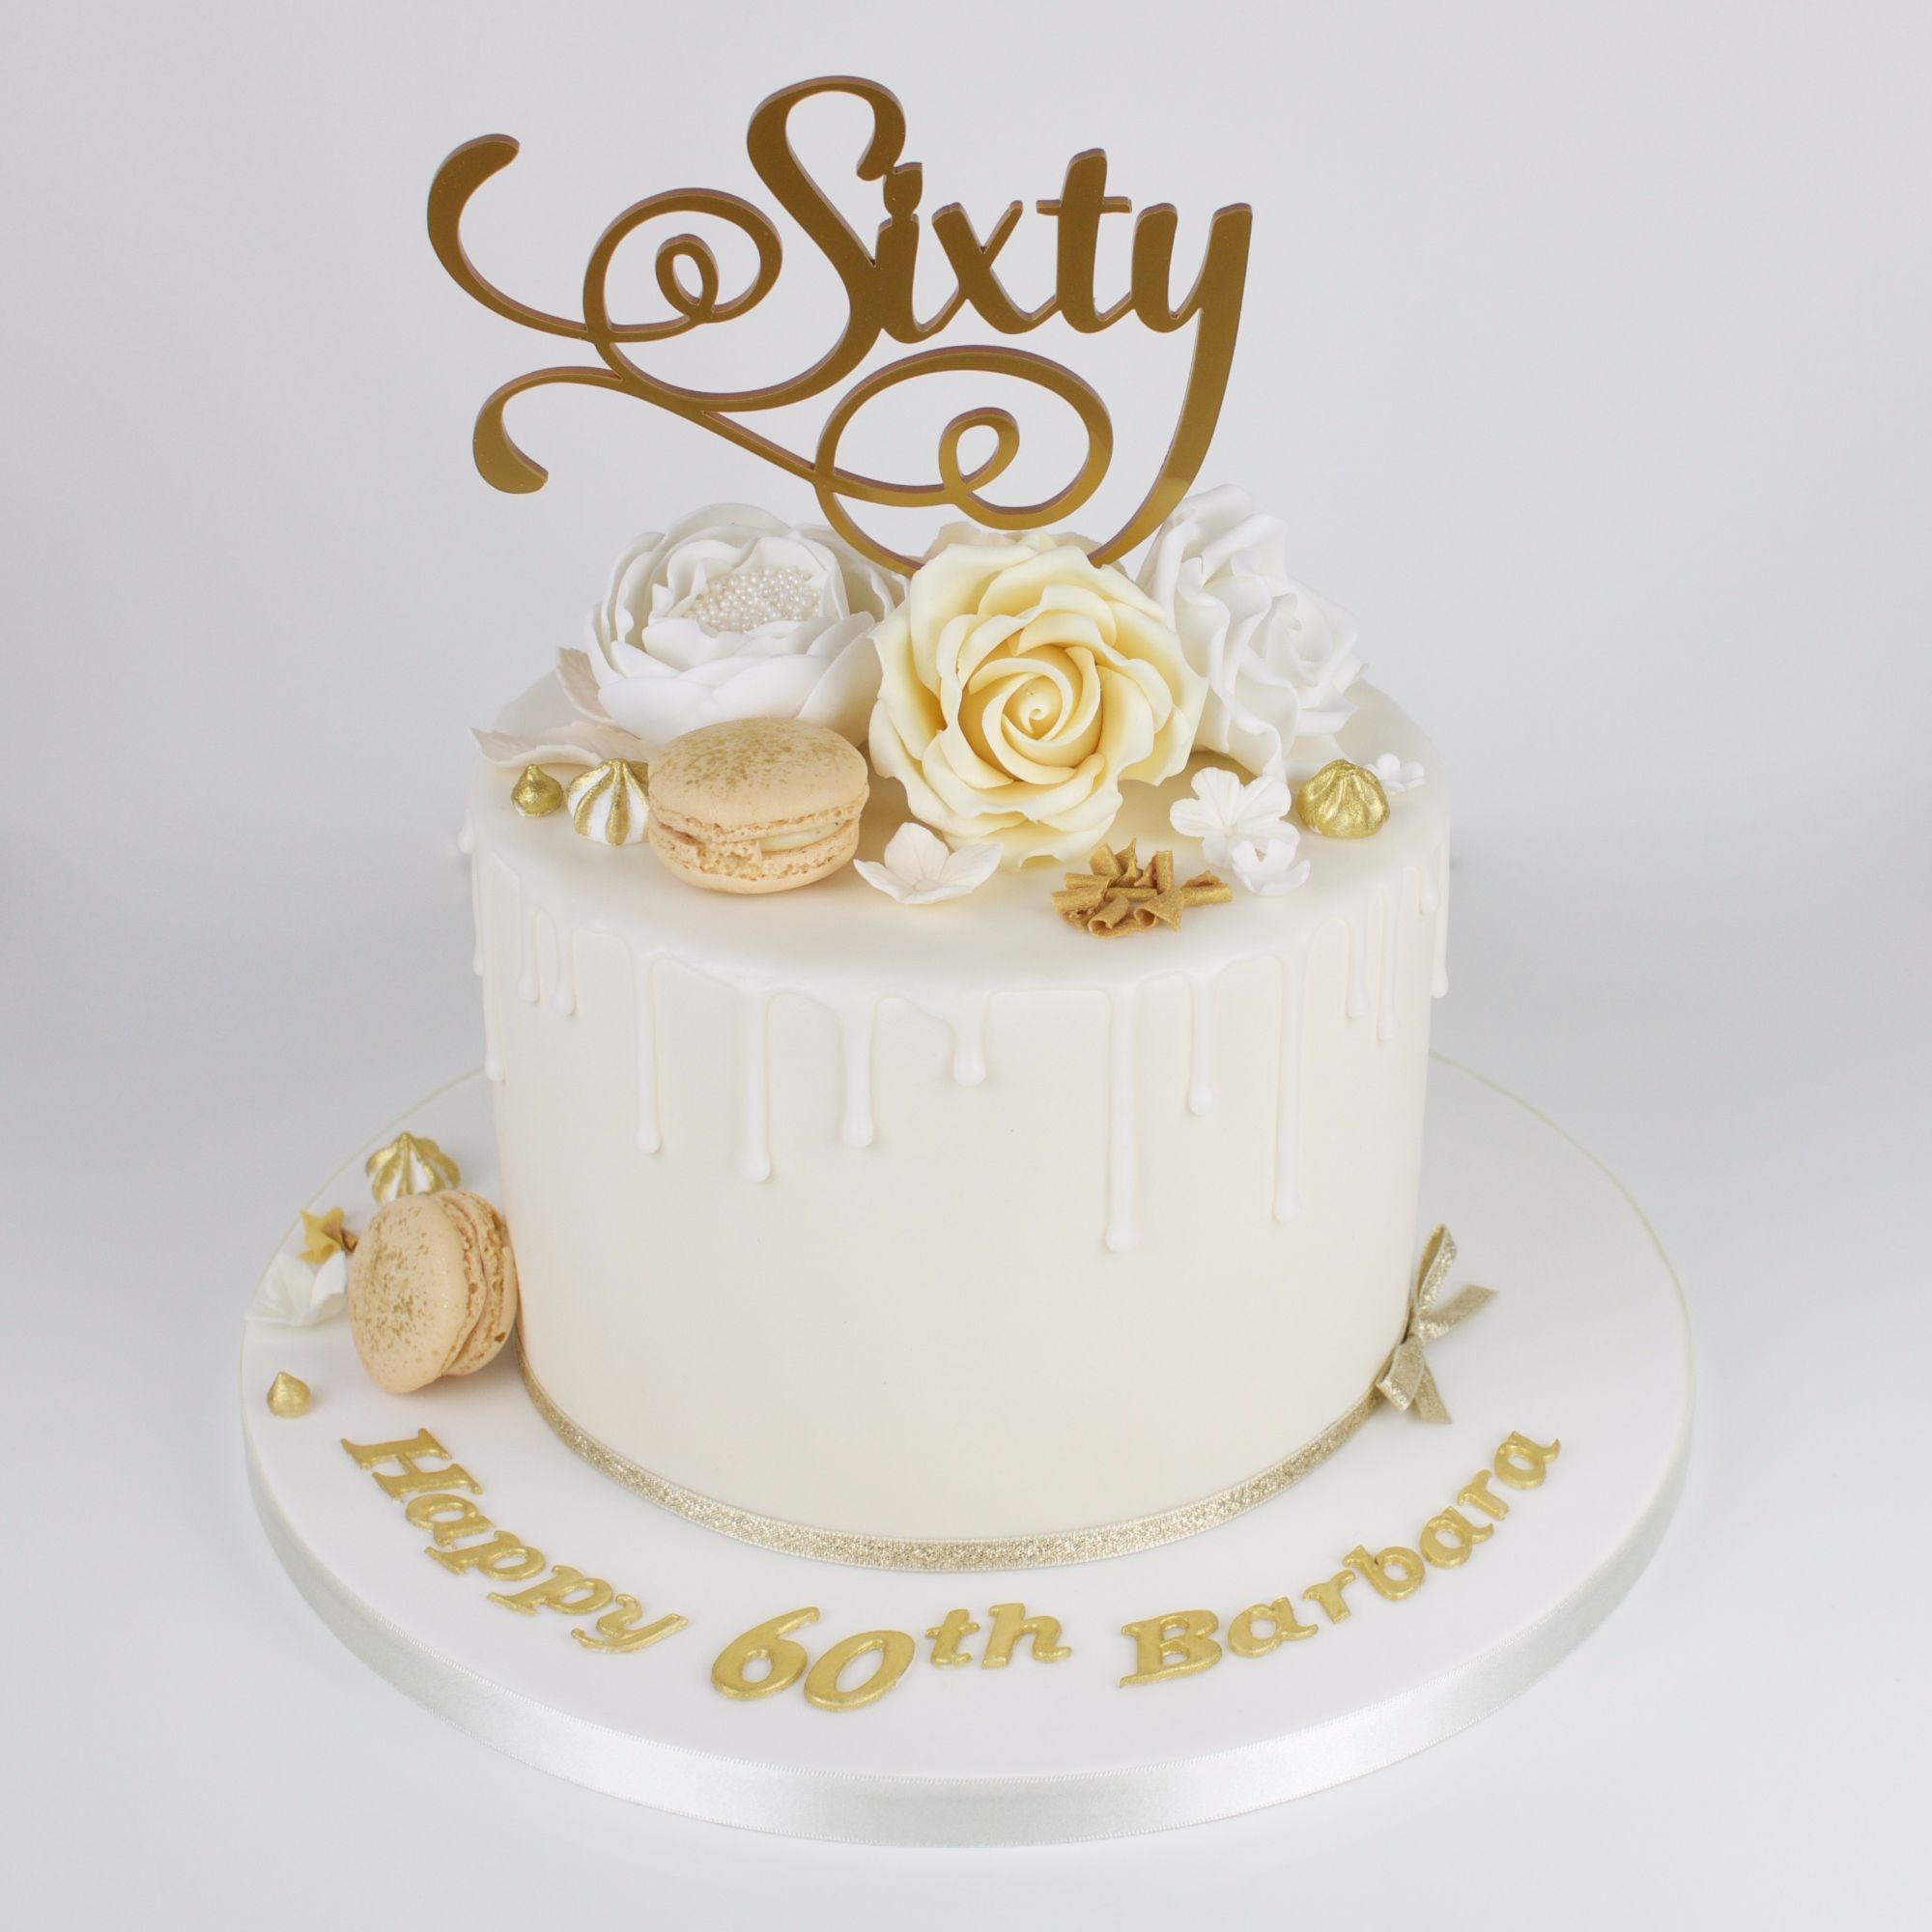 Celebration cakes   60th birthday cake for mom, 60th ...